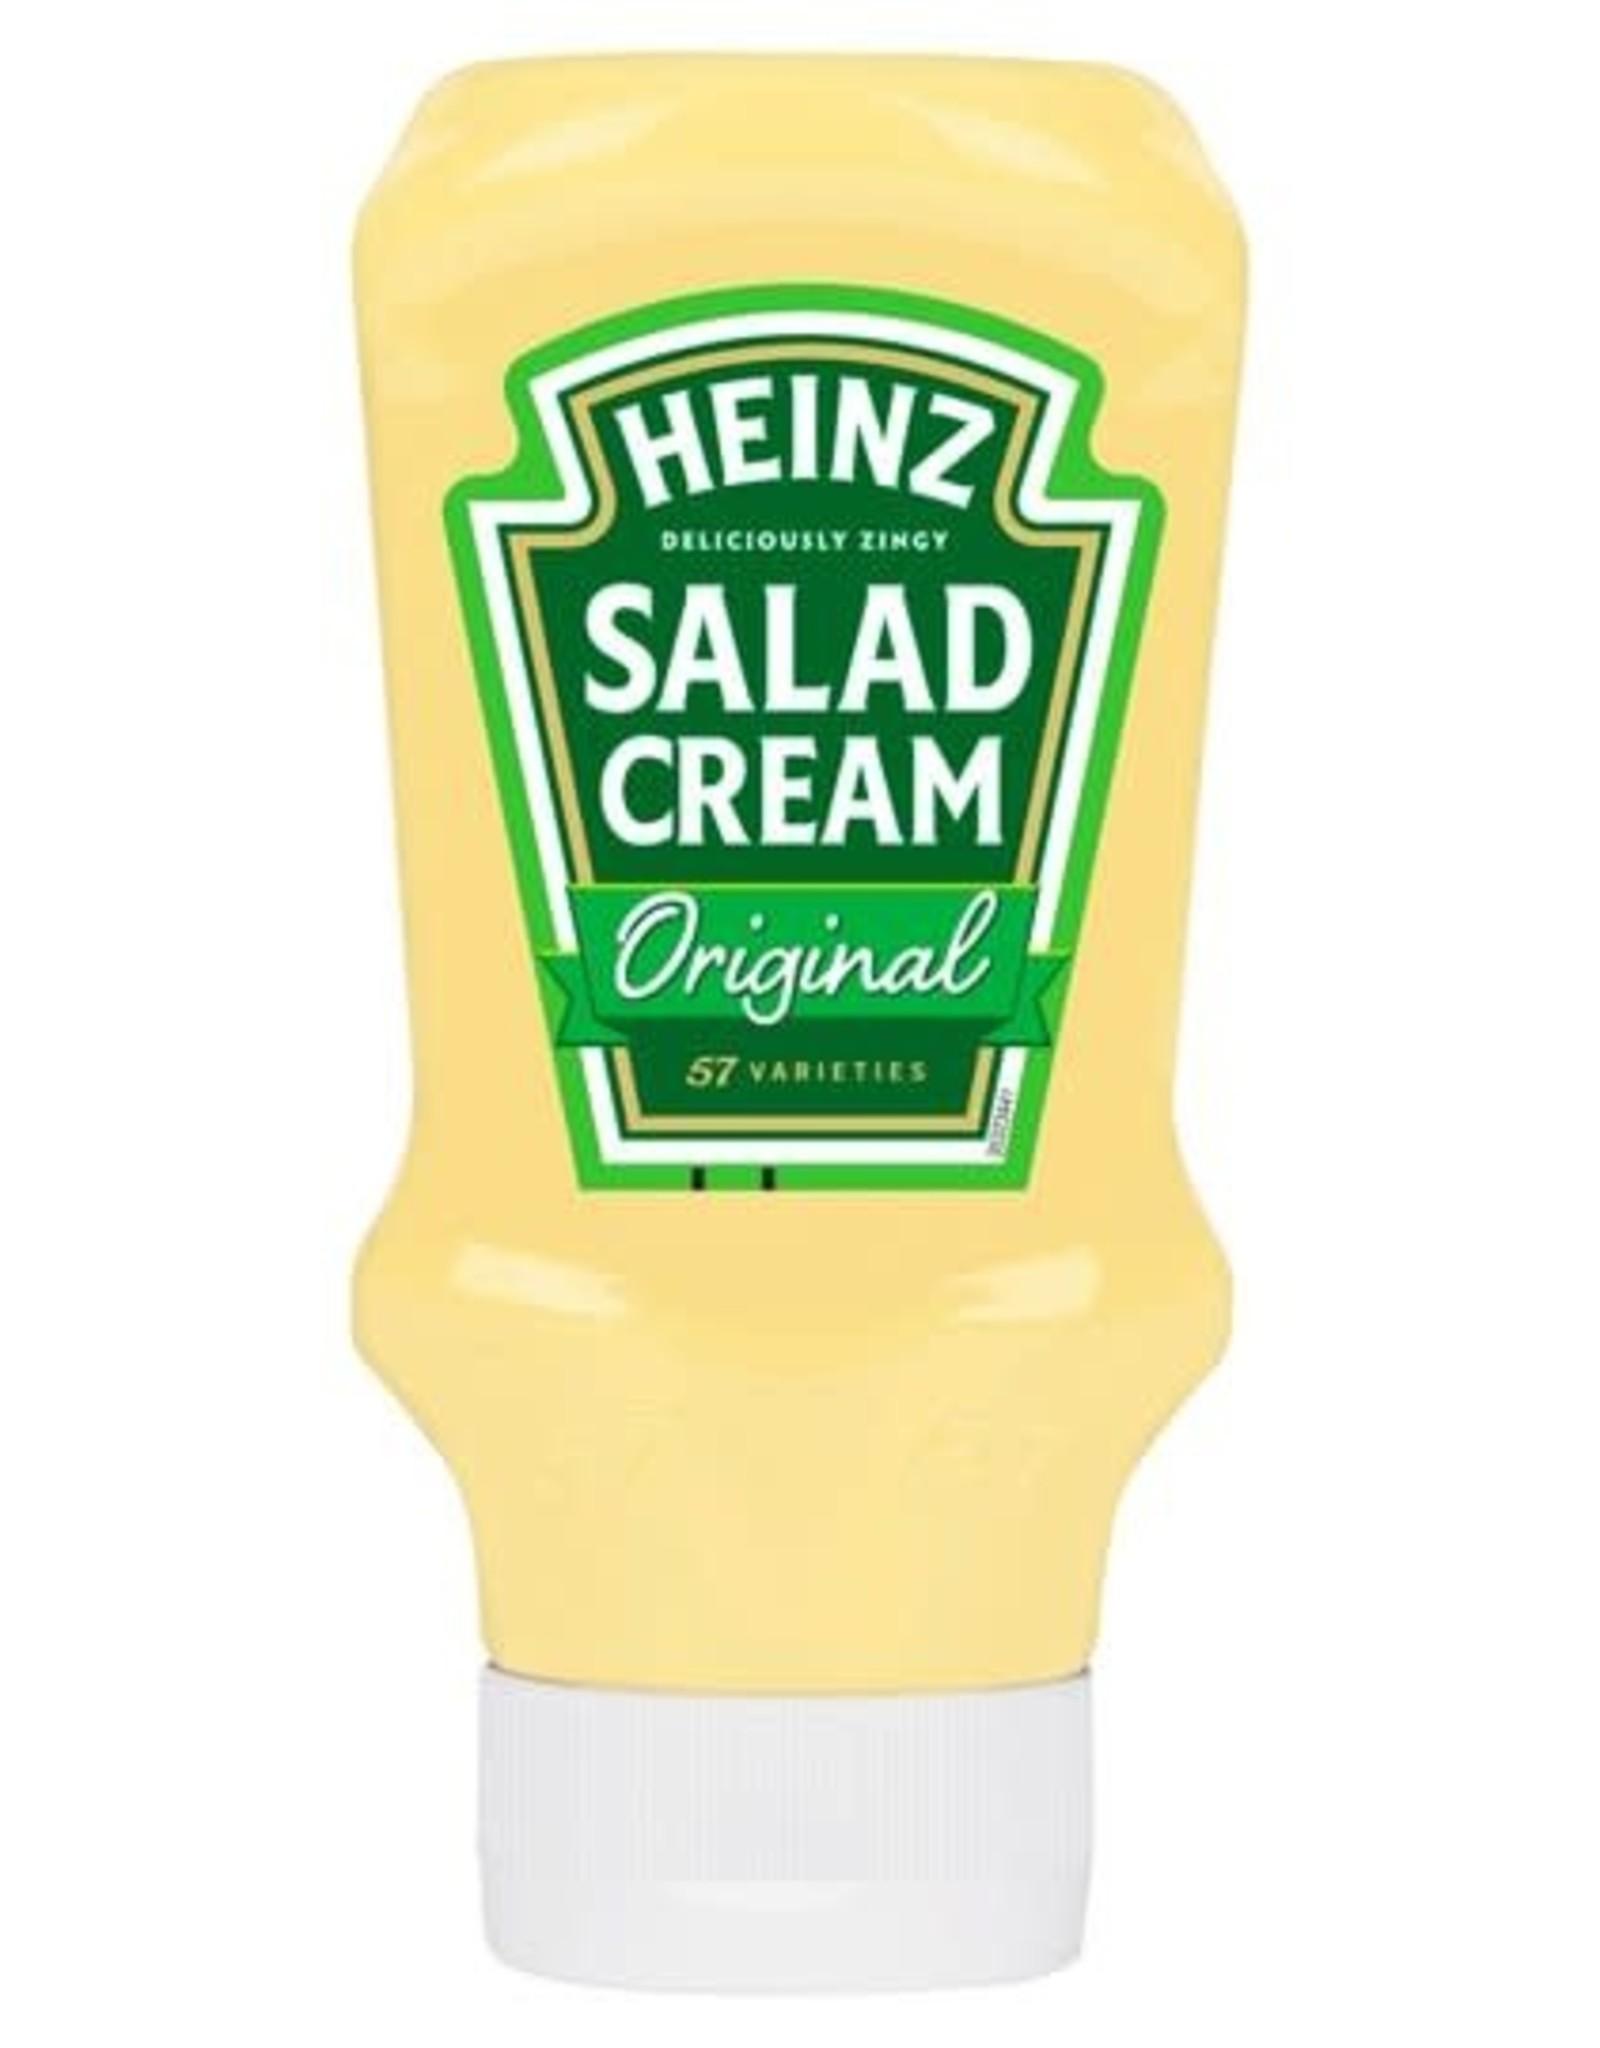 Heinz Heinz Salad Cream 425 g